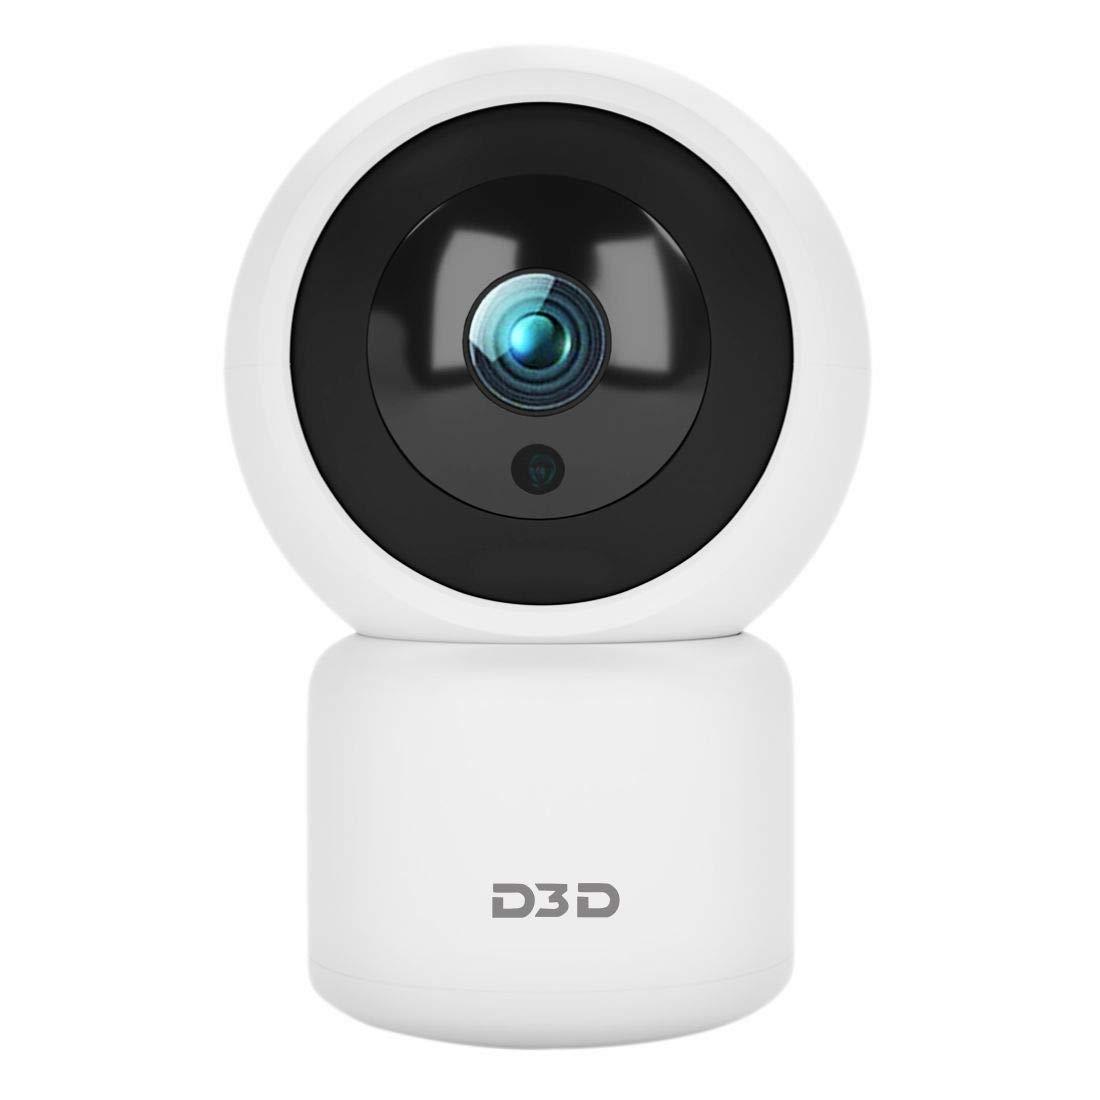 D3D T2816 HD 1080P Wifi Home Security Camera PTZ 360 (White)